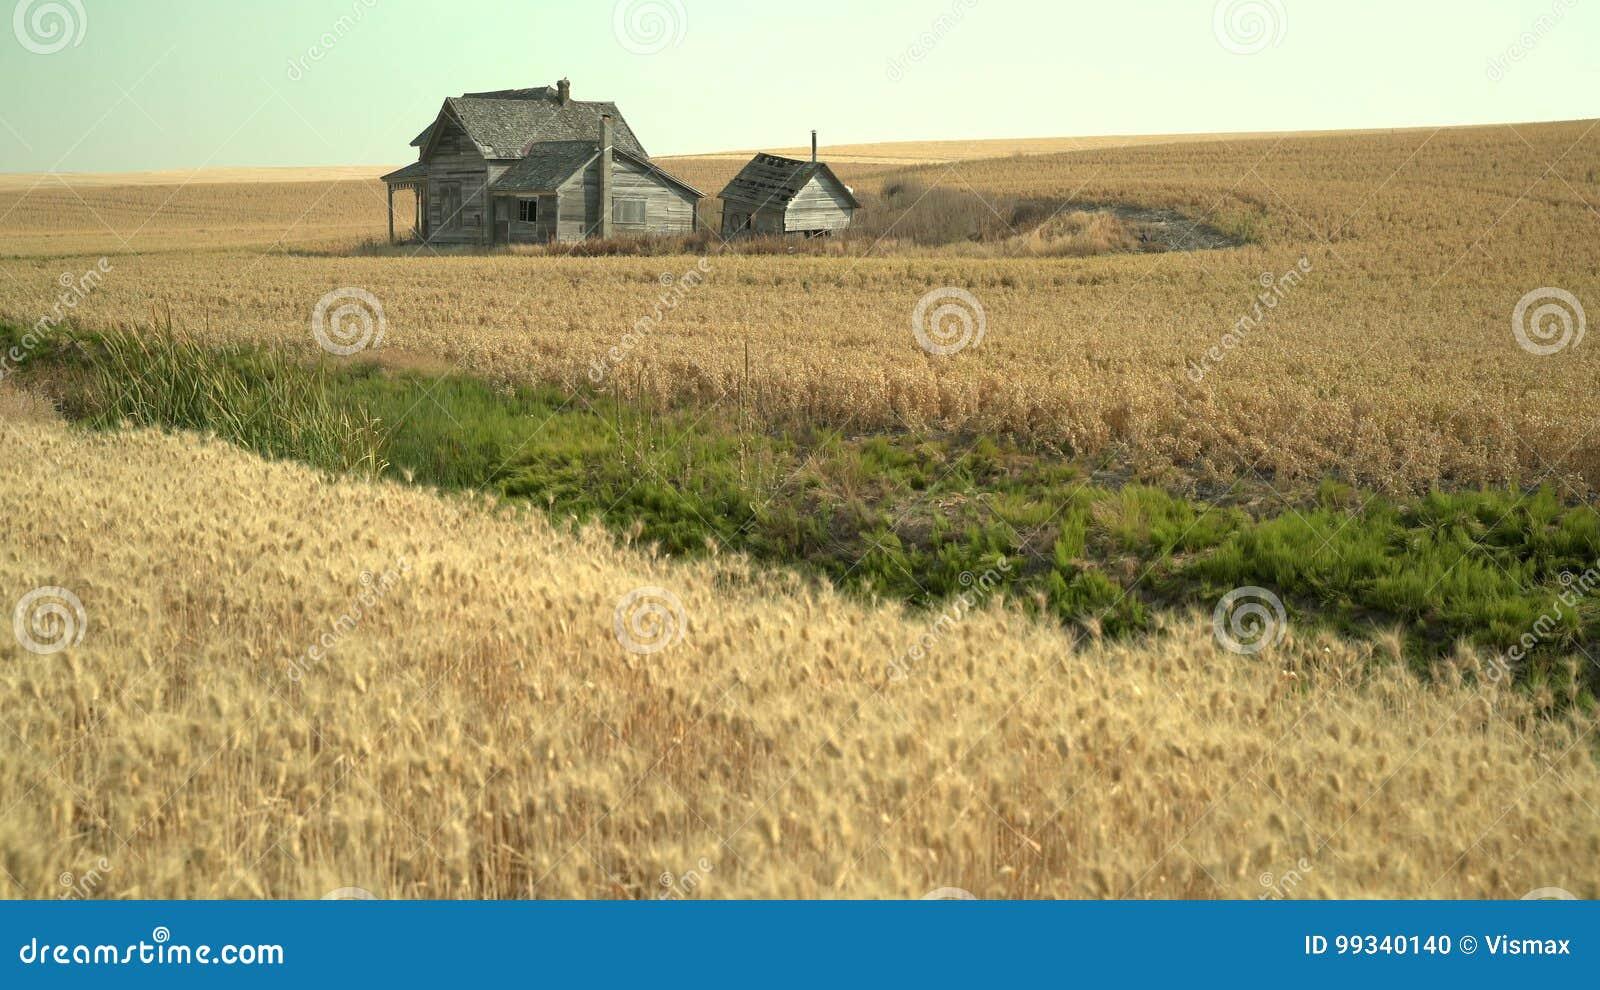 Abandoned Farmhouse Palouse Washington State 4k Uhd